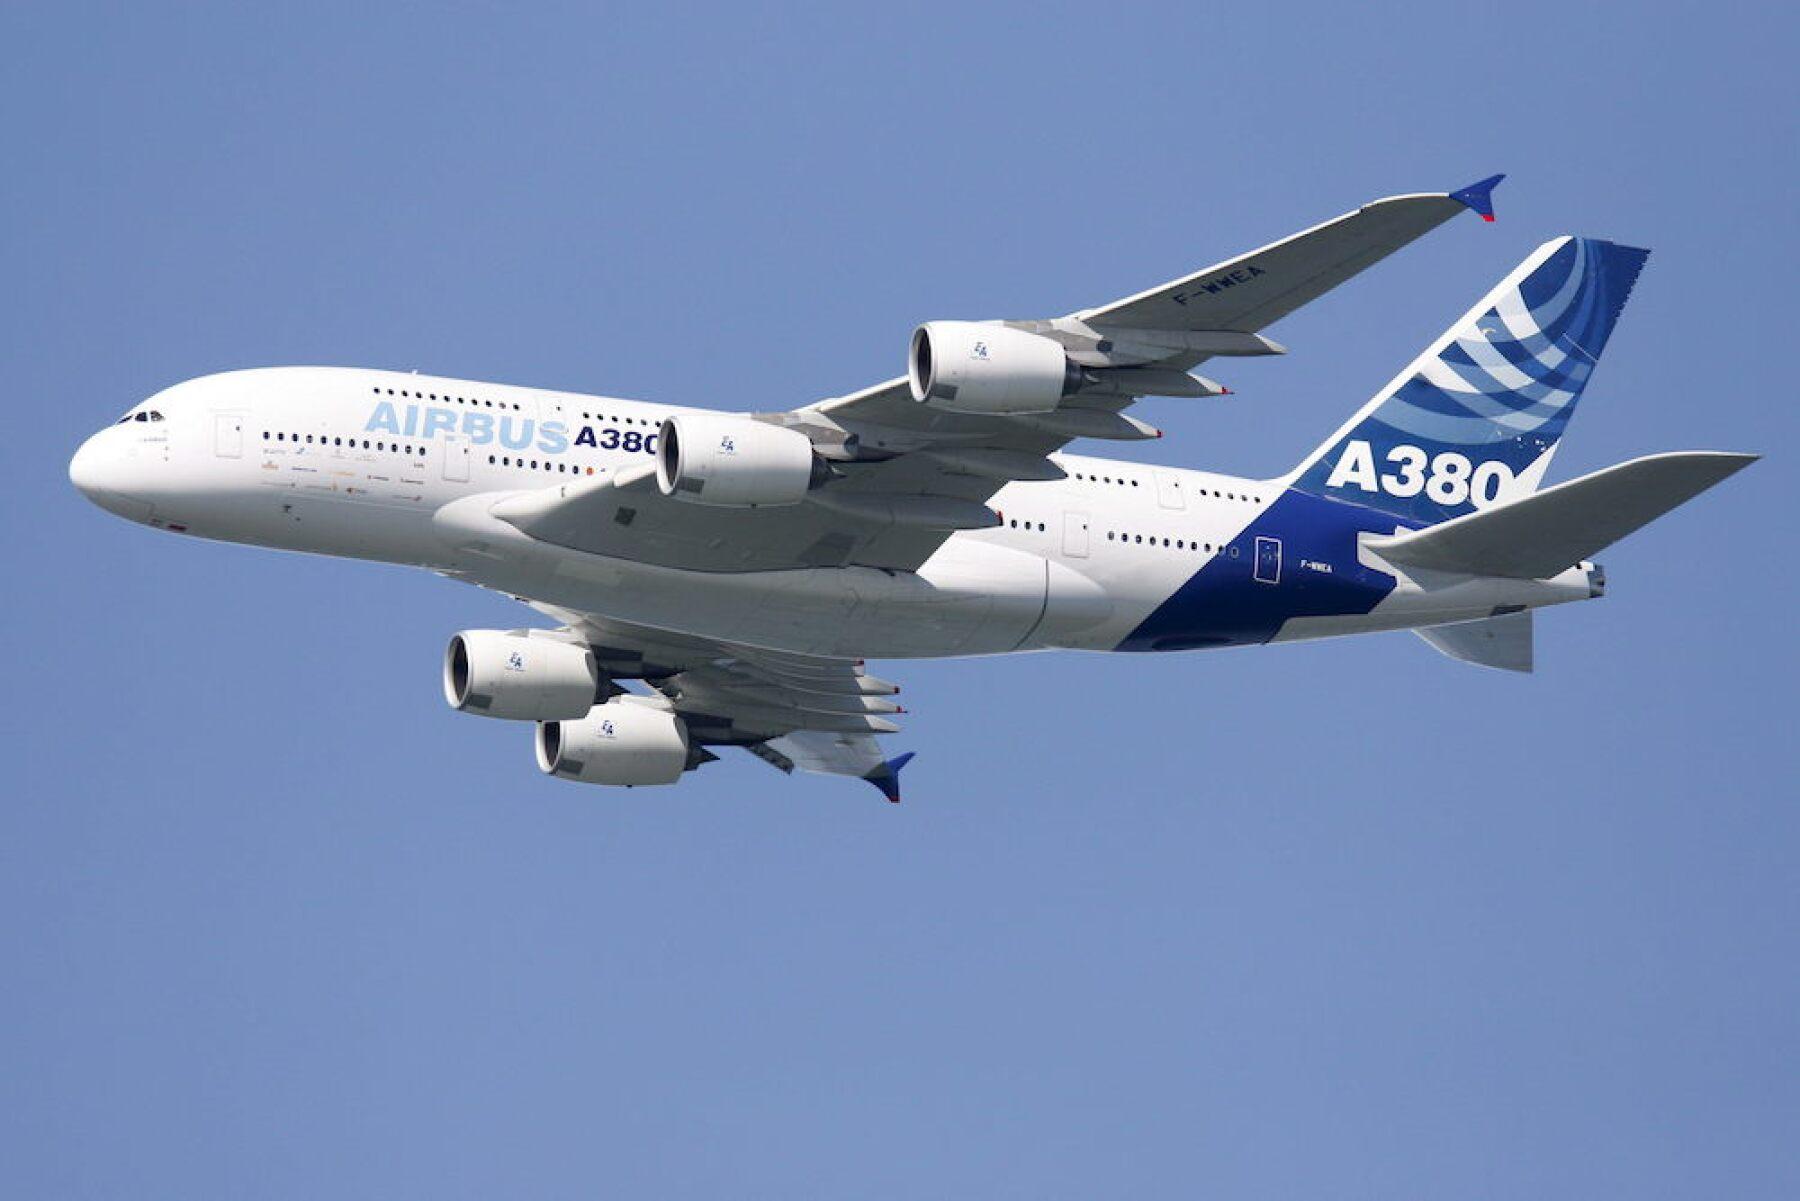 AIRBUS A380 ATERRIZA EN SAN FRANCISCO